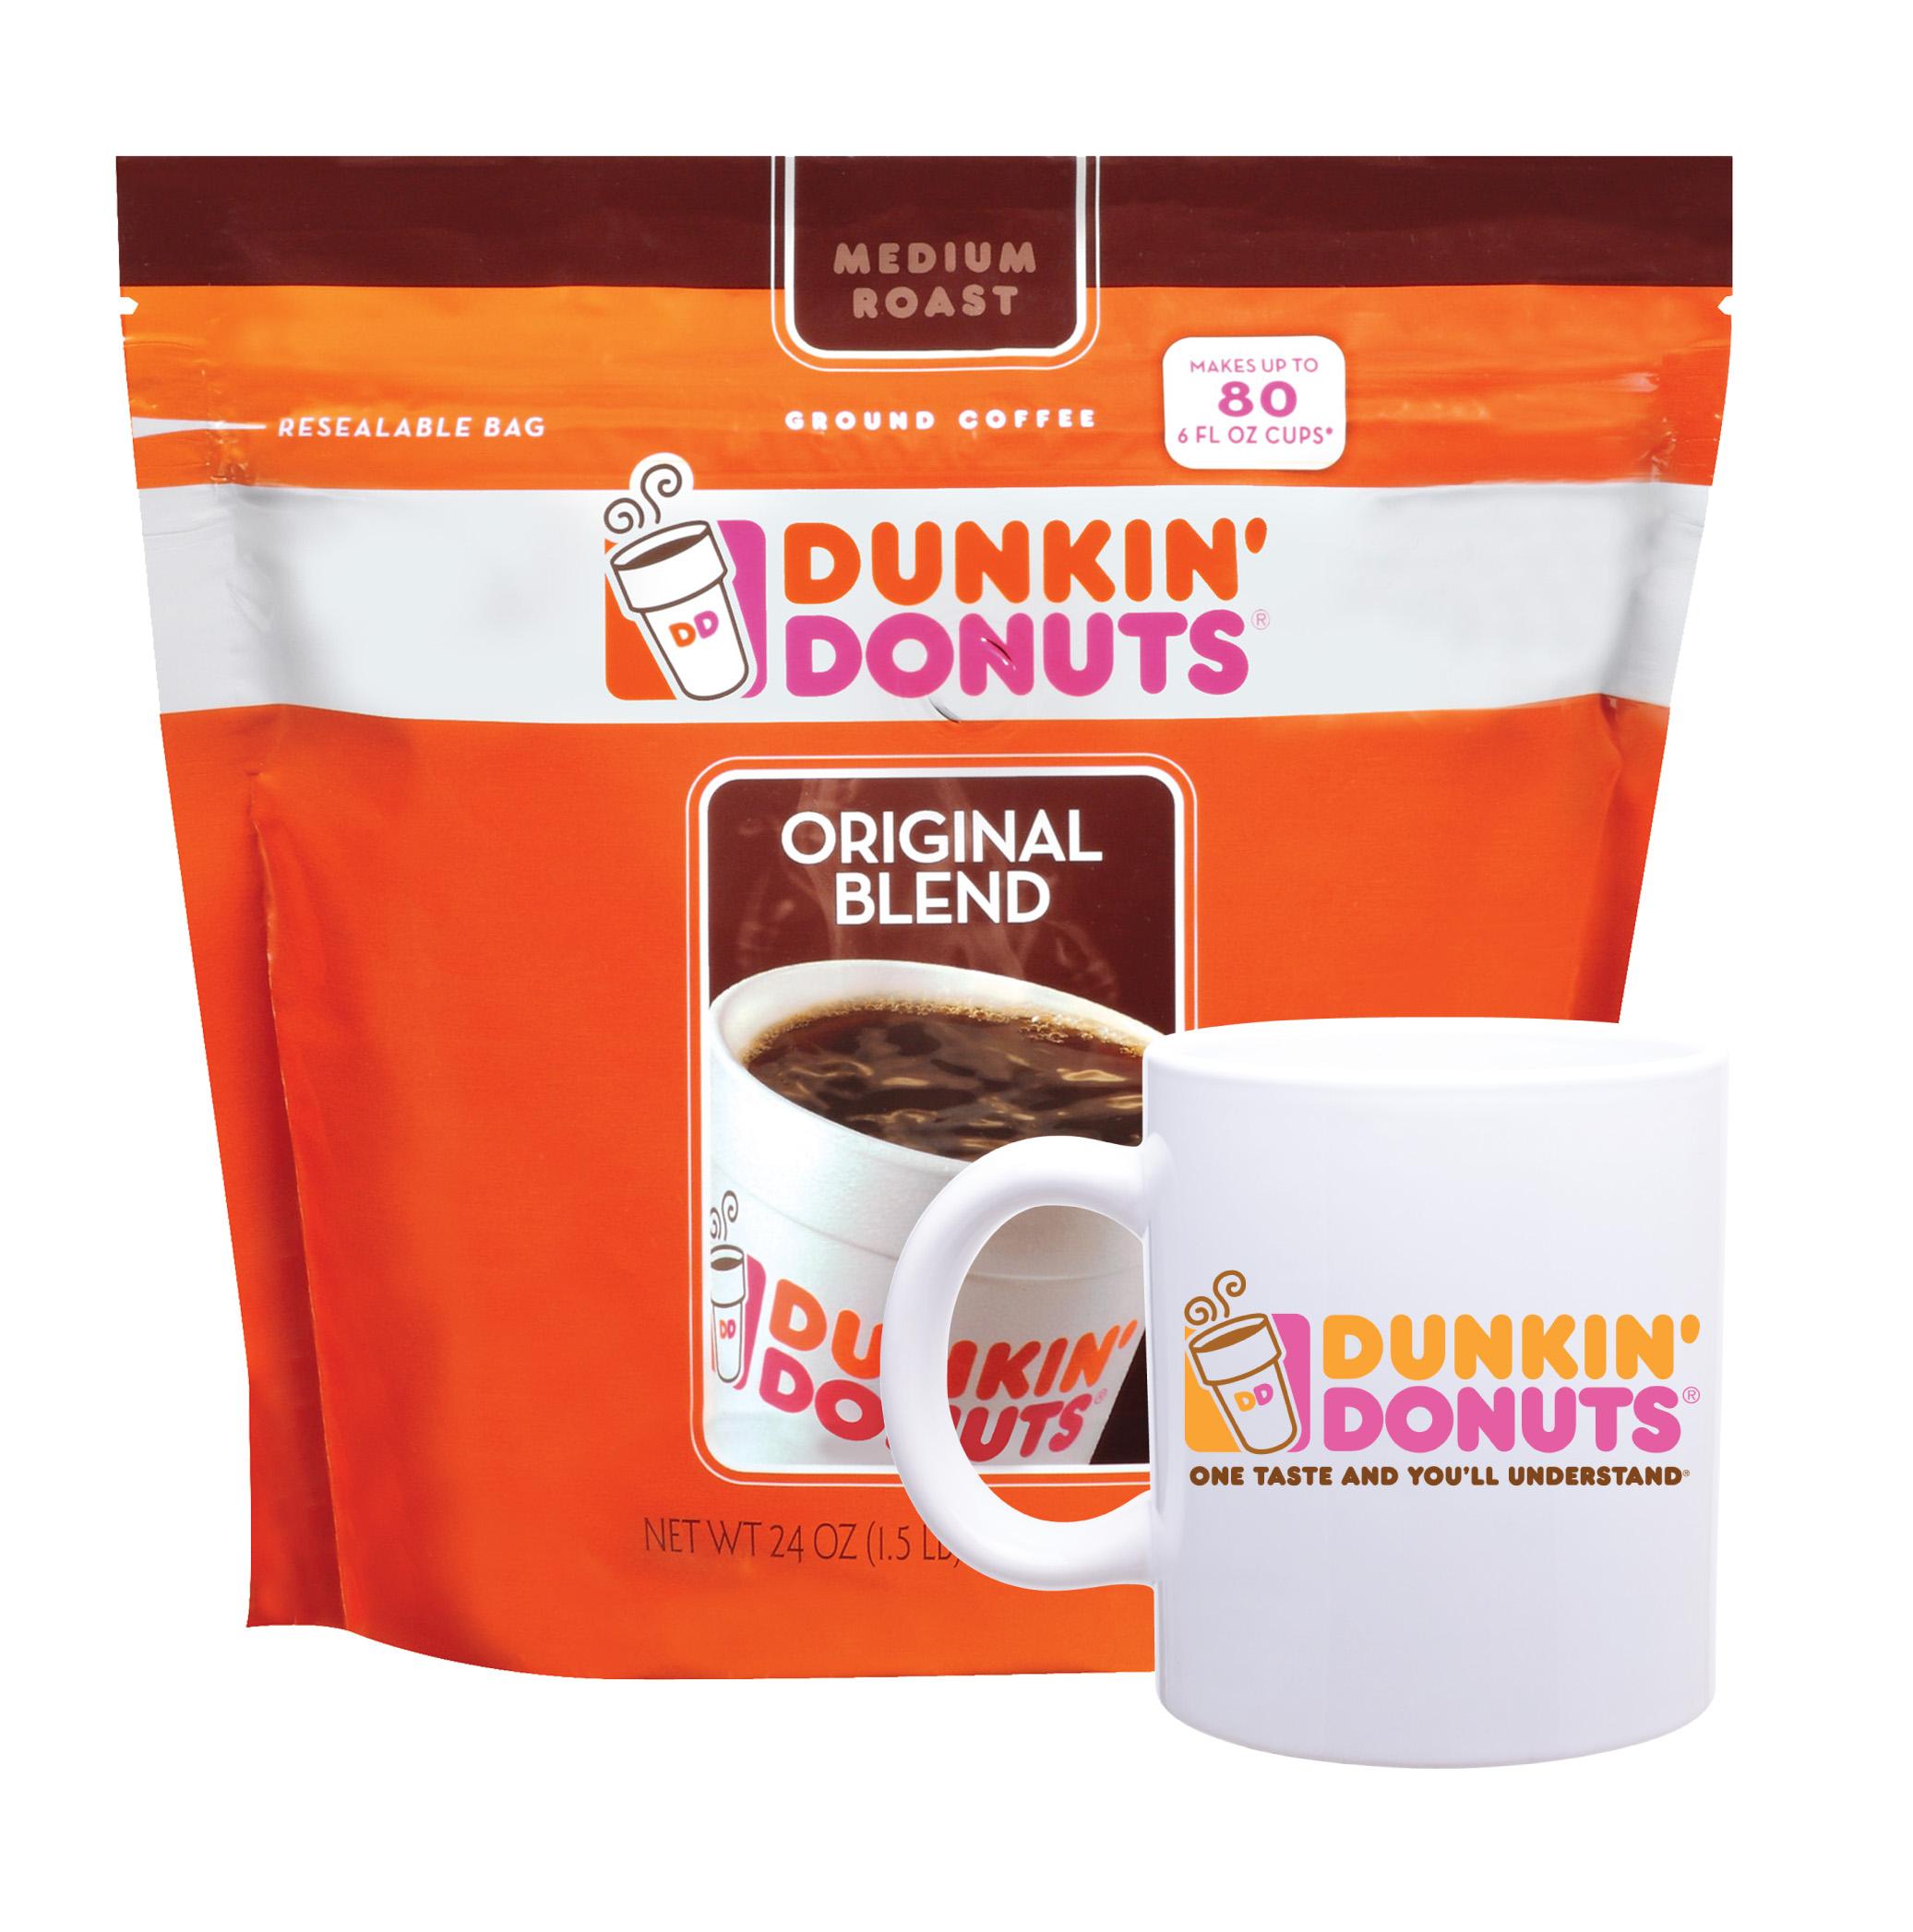 Dunkin Donuts Travel Mug Promotion